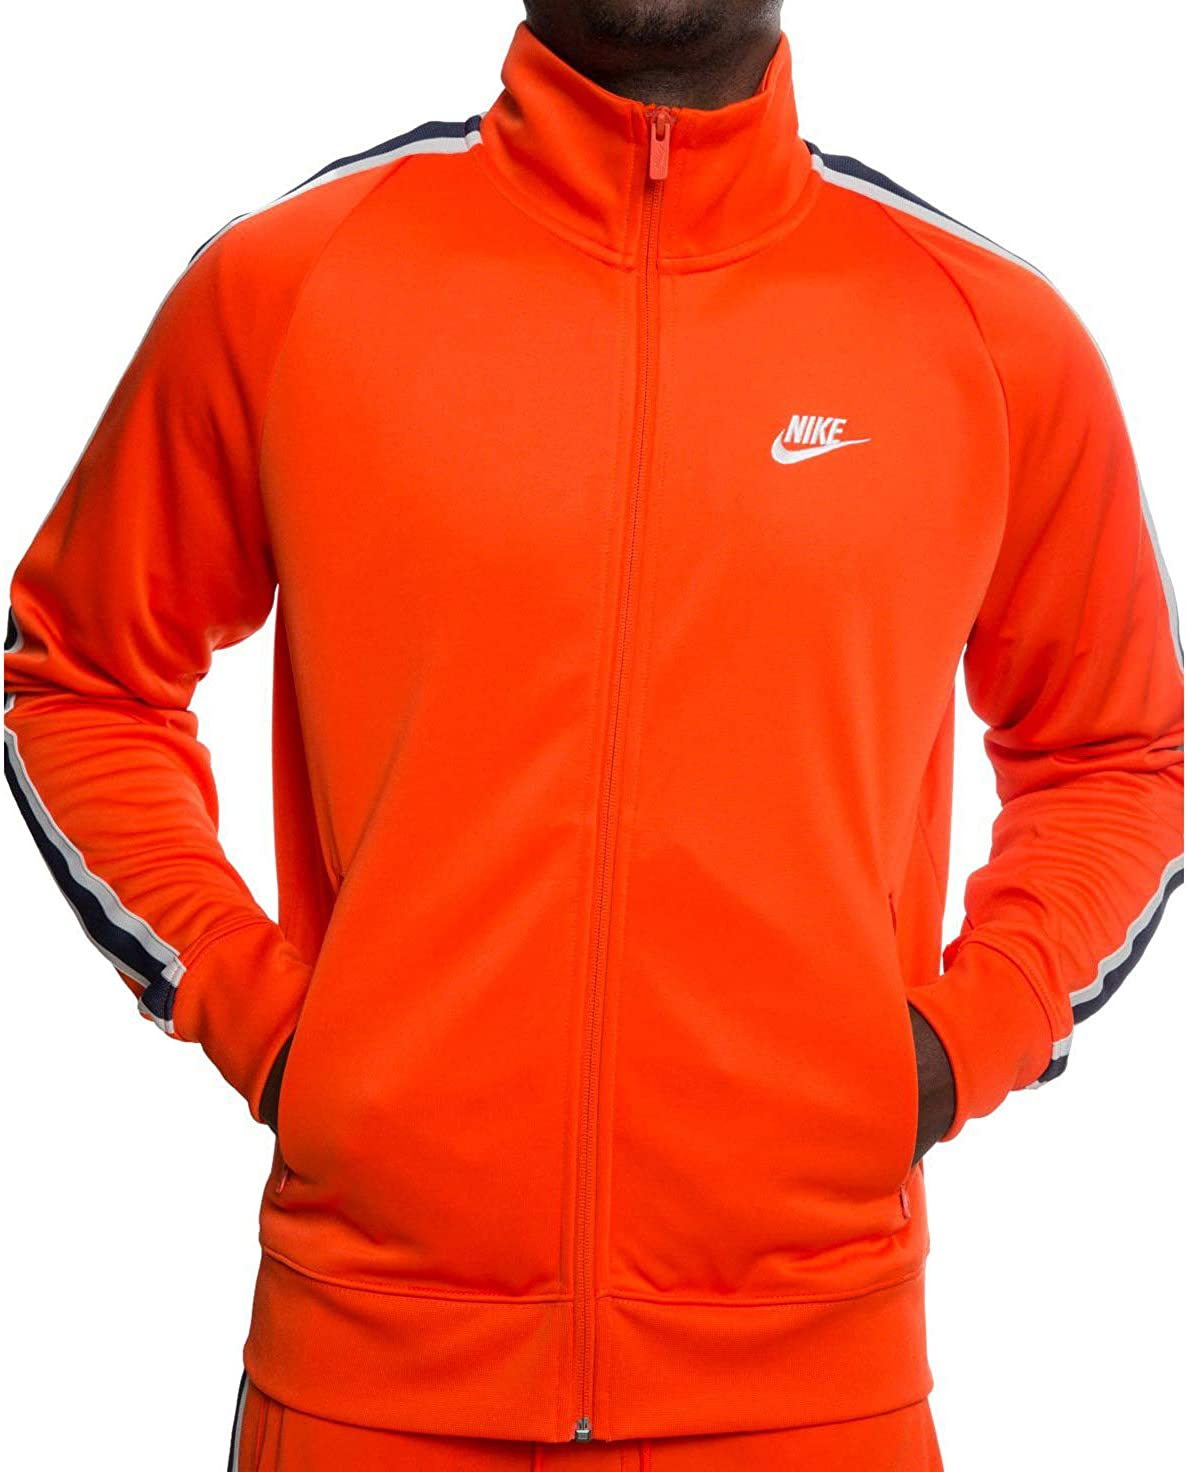 Nike Mens Fitness Workout Track Jacket